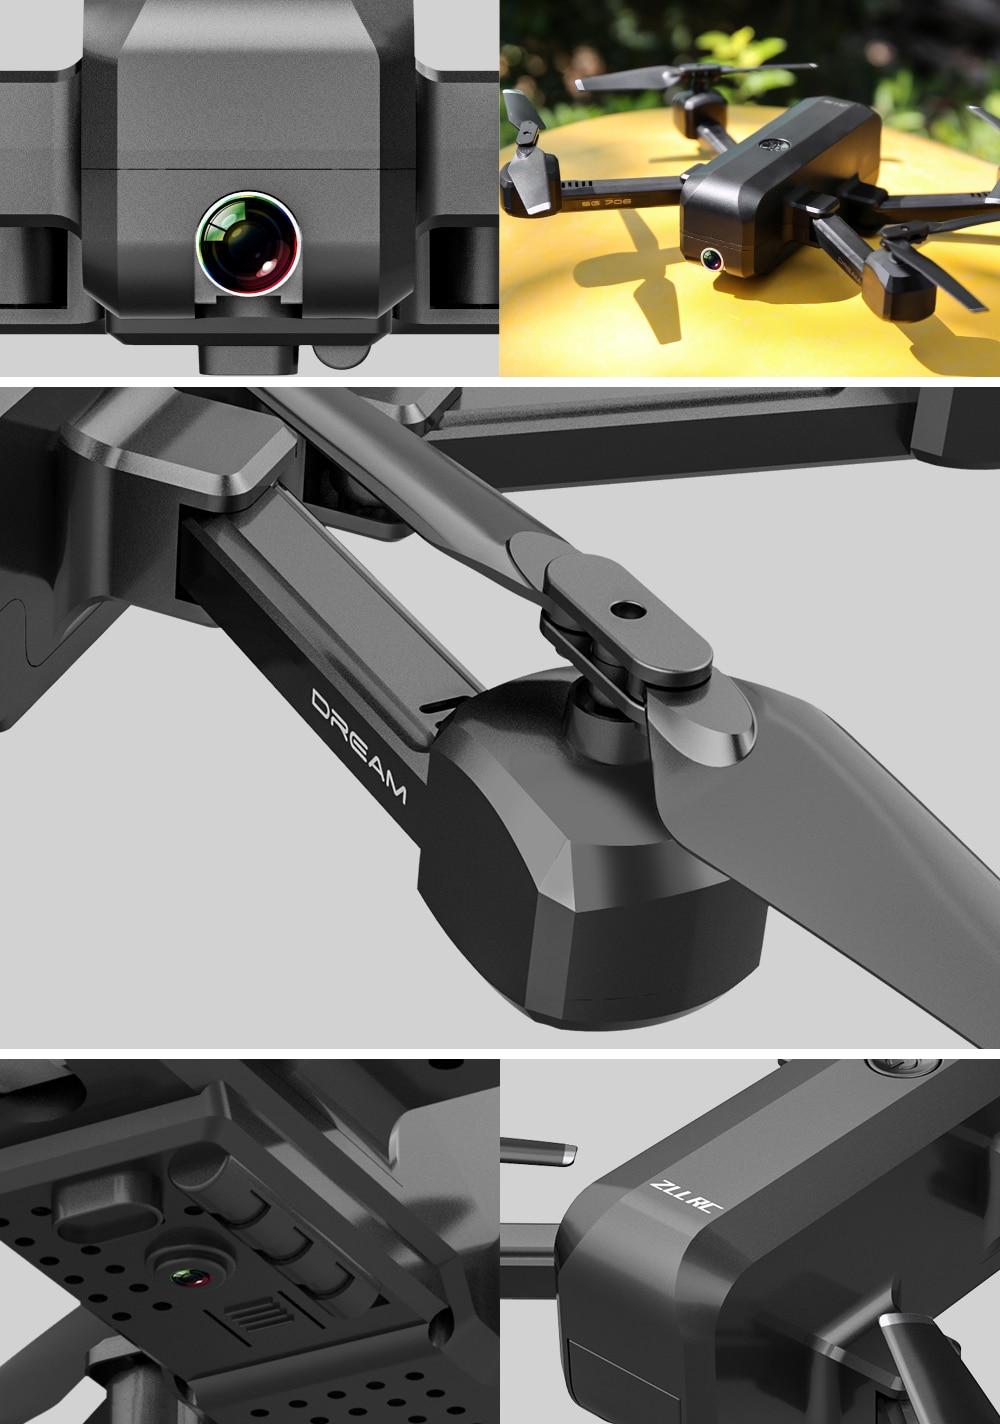 SG706 Quadcopter Drone 4K 1080P Dual Camera WiFi FPV Optical Flow Profissional RC Drone Foldable Quadrocopter Toys